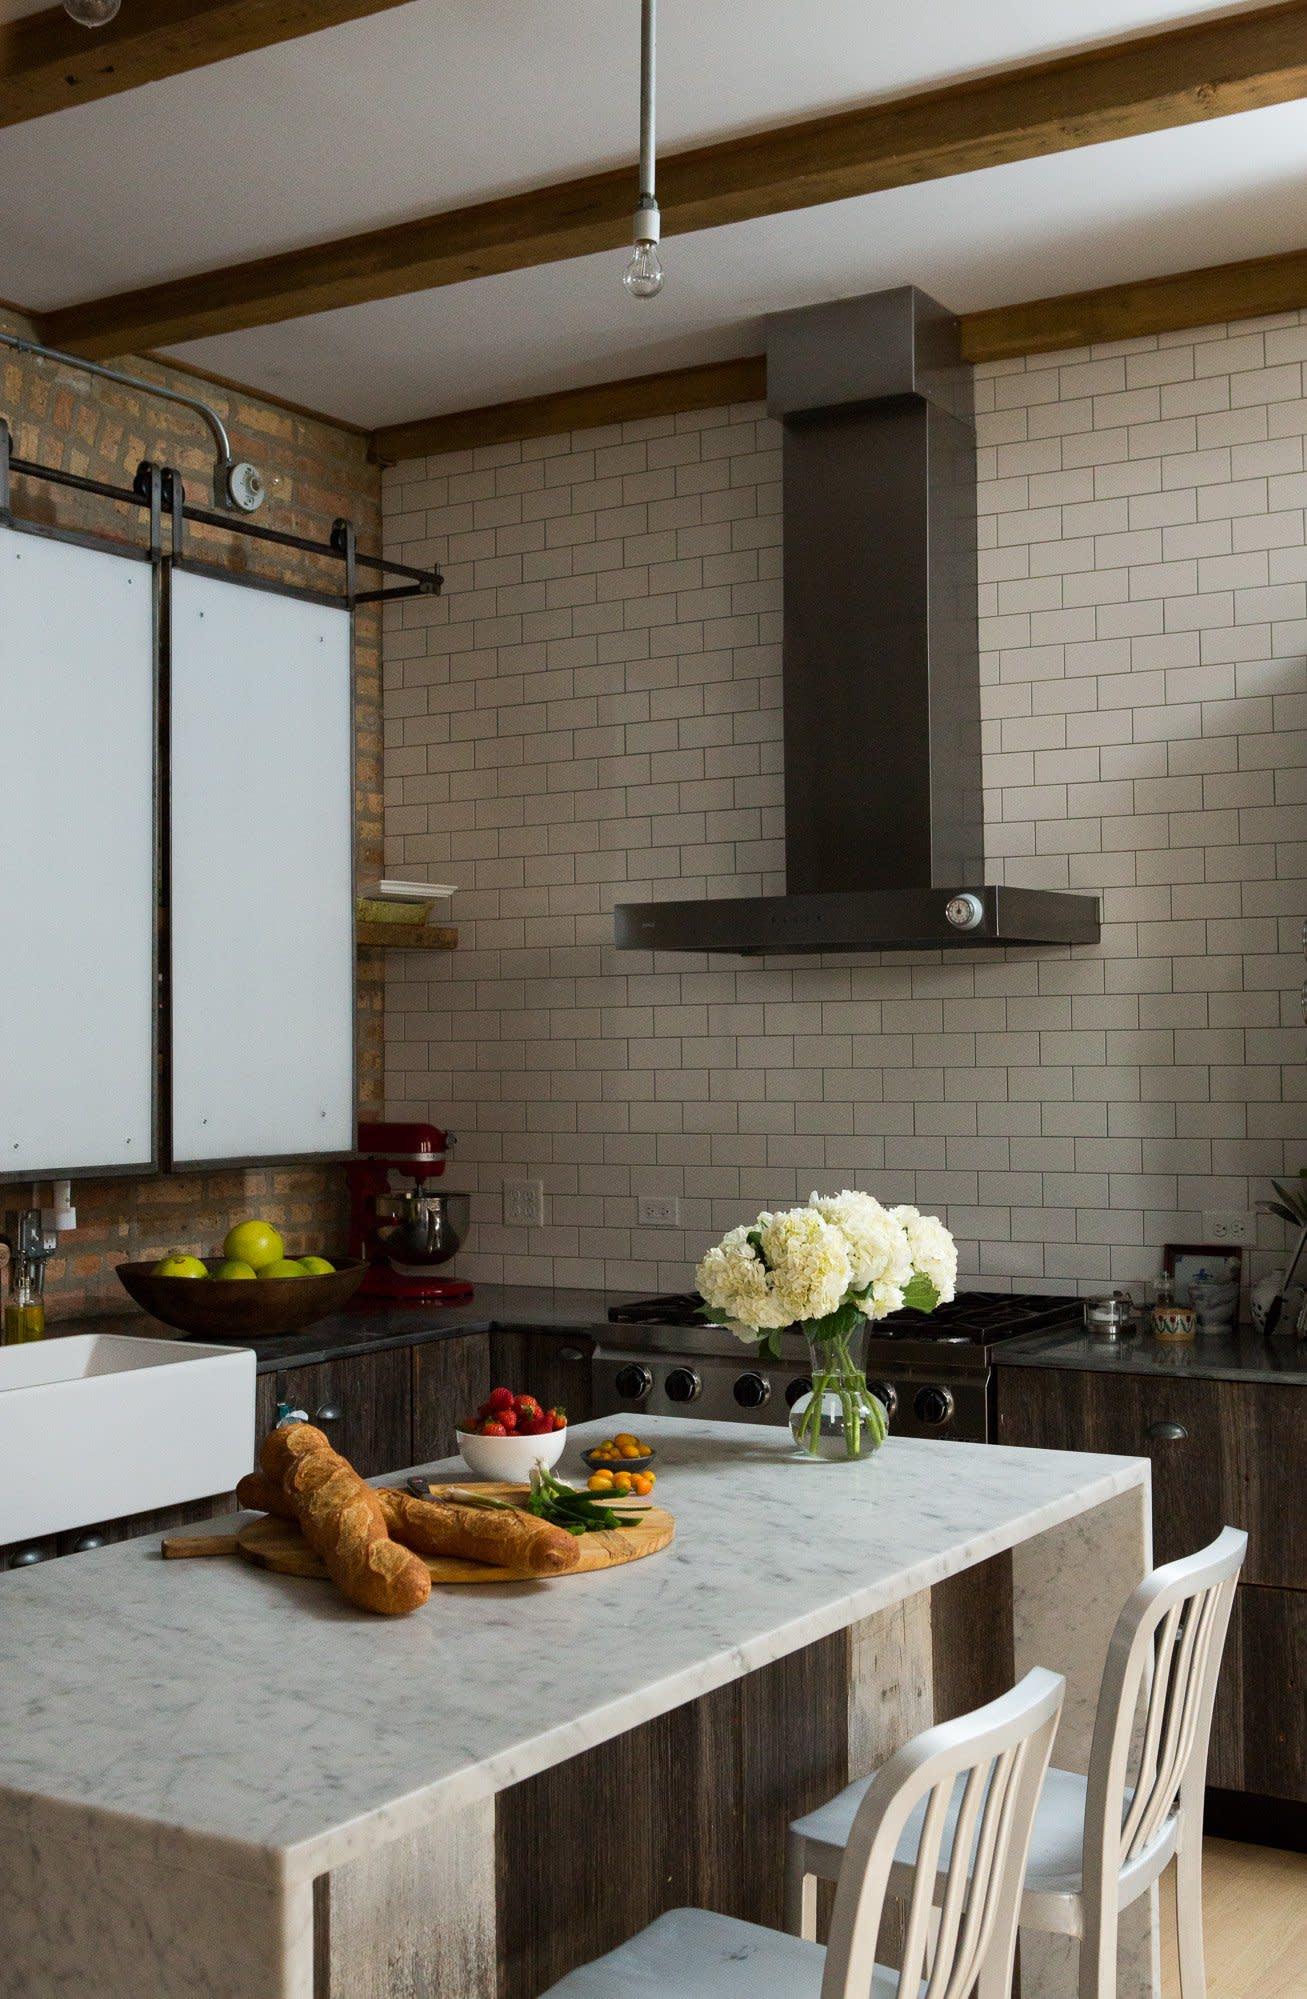 Ellen & Greg's Renovated Loft Kitchen: gallery image 5